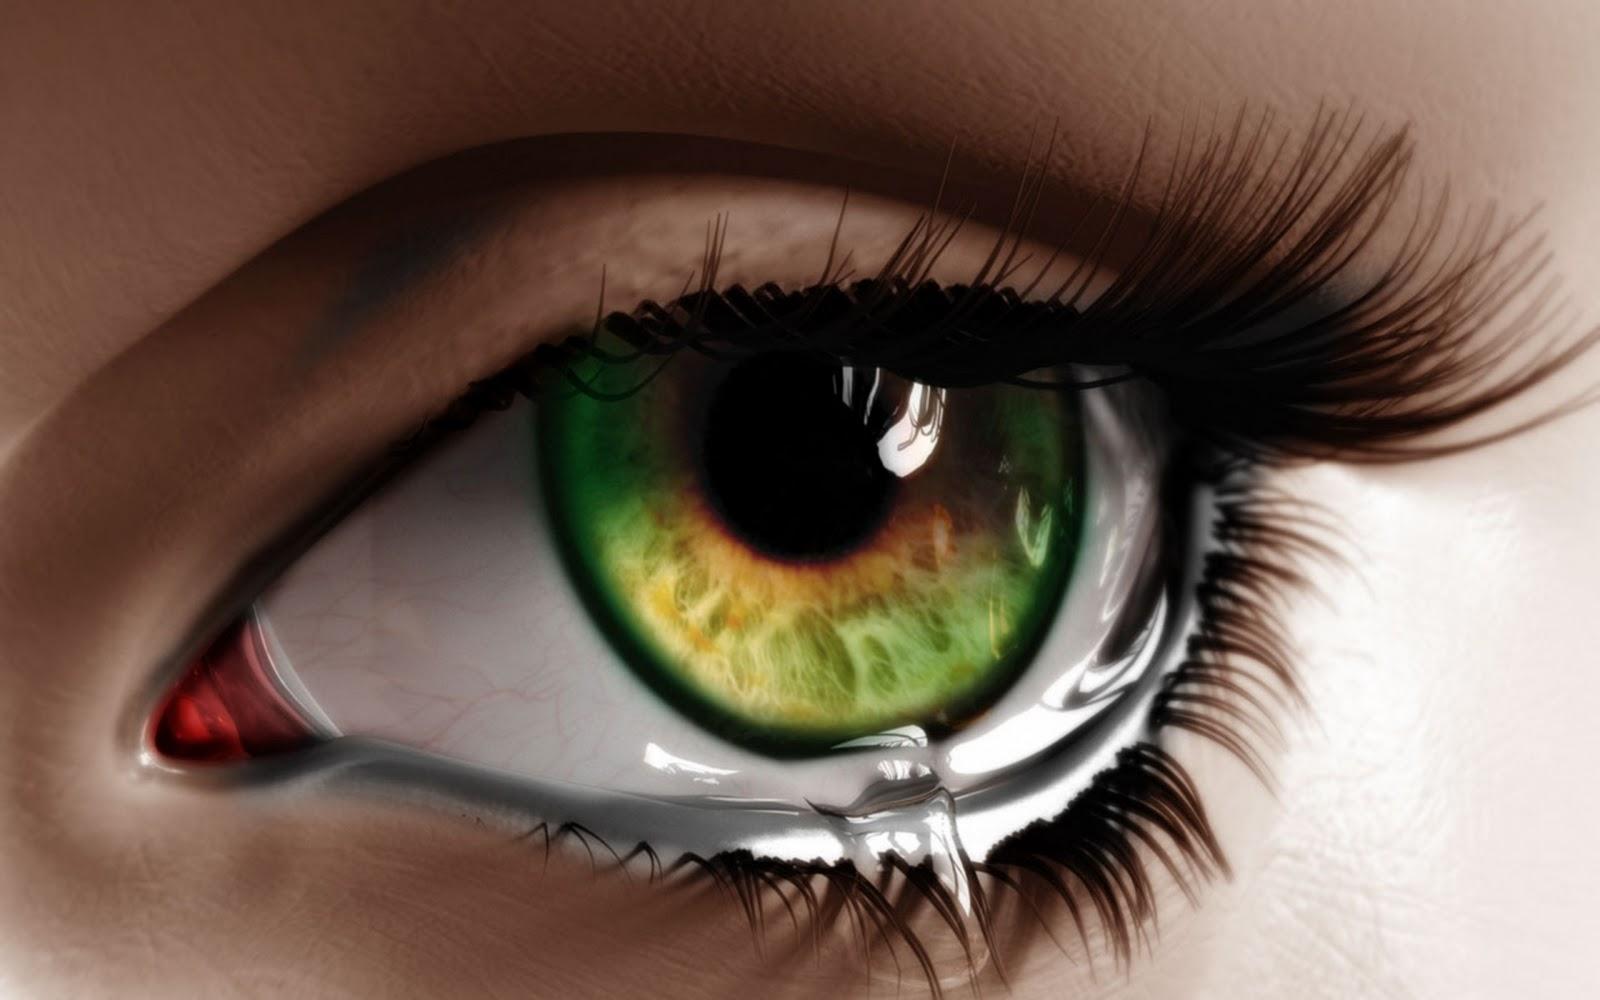 http://2.bp.blogspot.com/-BLsiayf9_Xc/TvsYssEqtdI/AAAAAAAAA8U/5stnb7KyLb4/s1600/tears+from+lovely+eyes.jpg